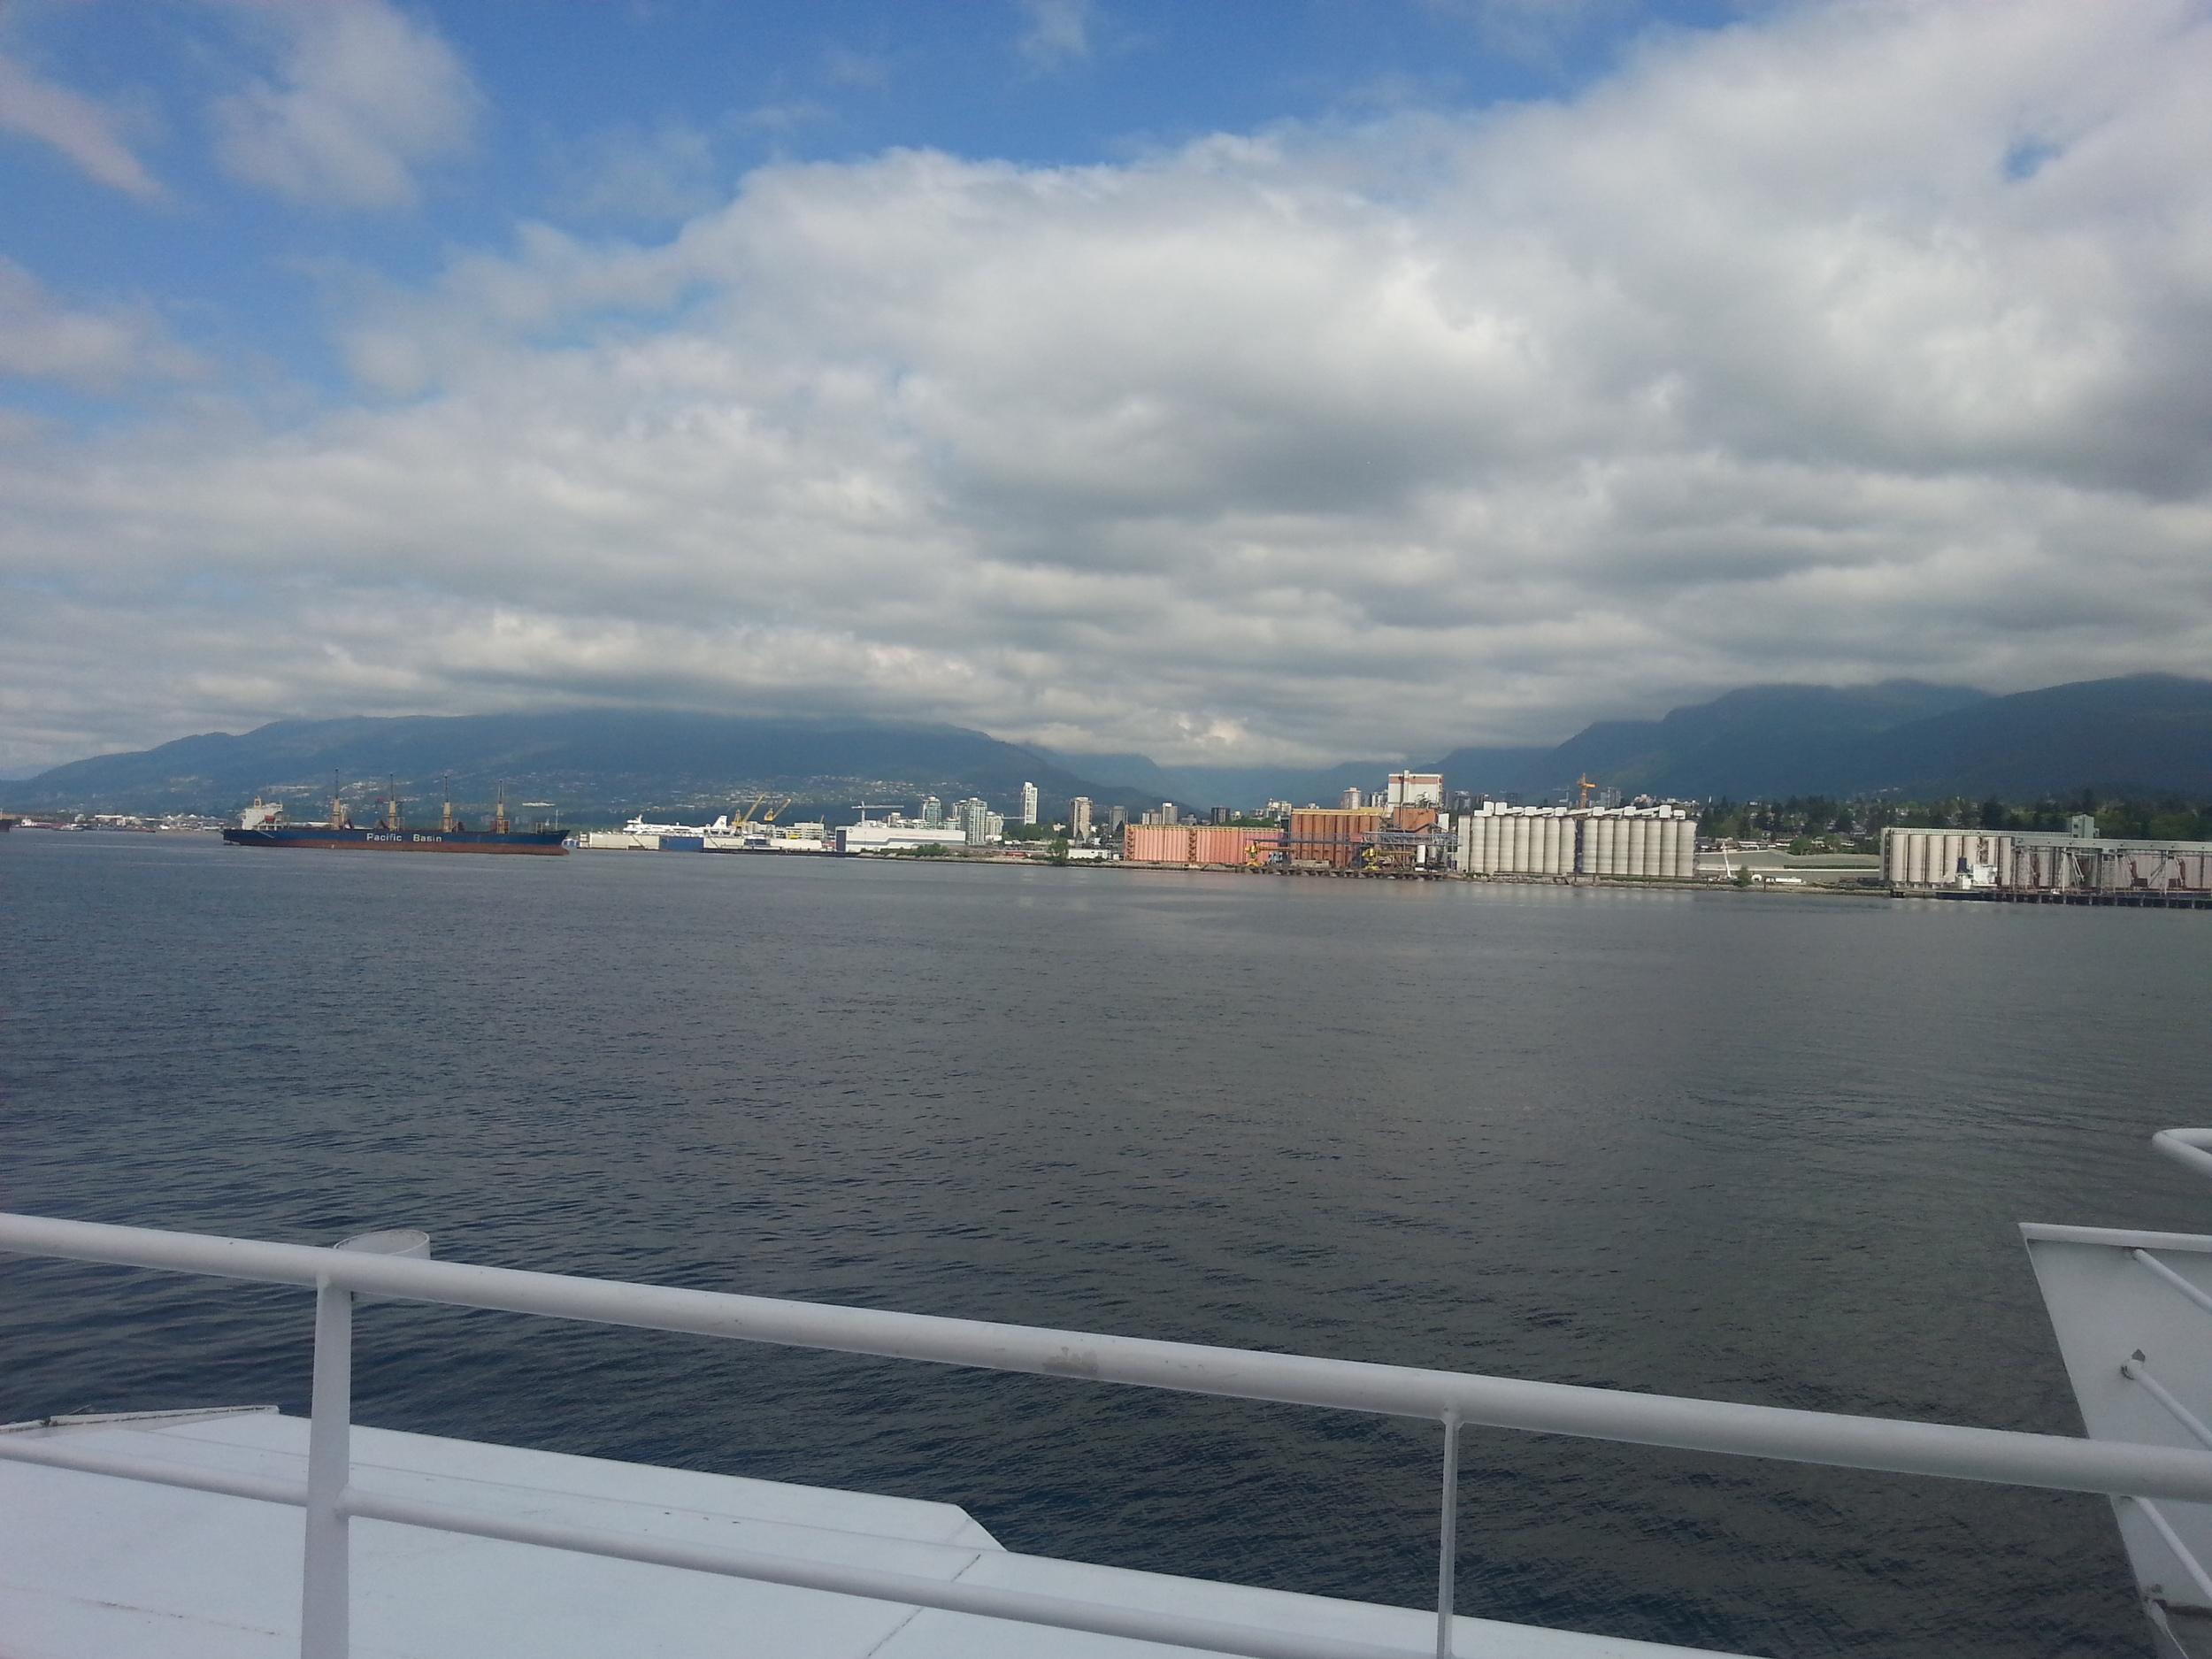 Vancouver. So near yet so far.